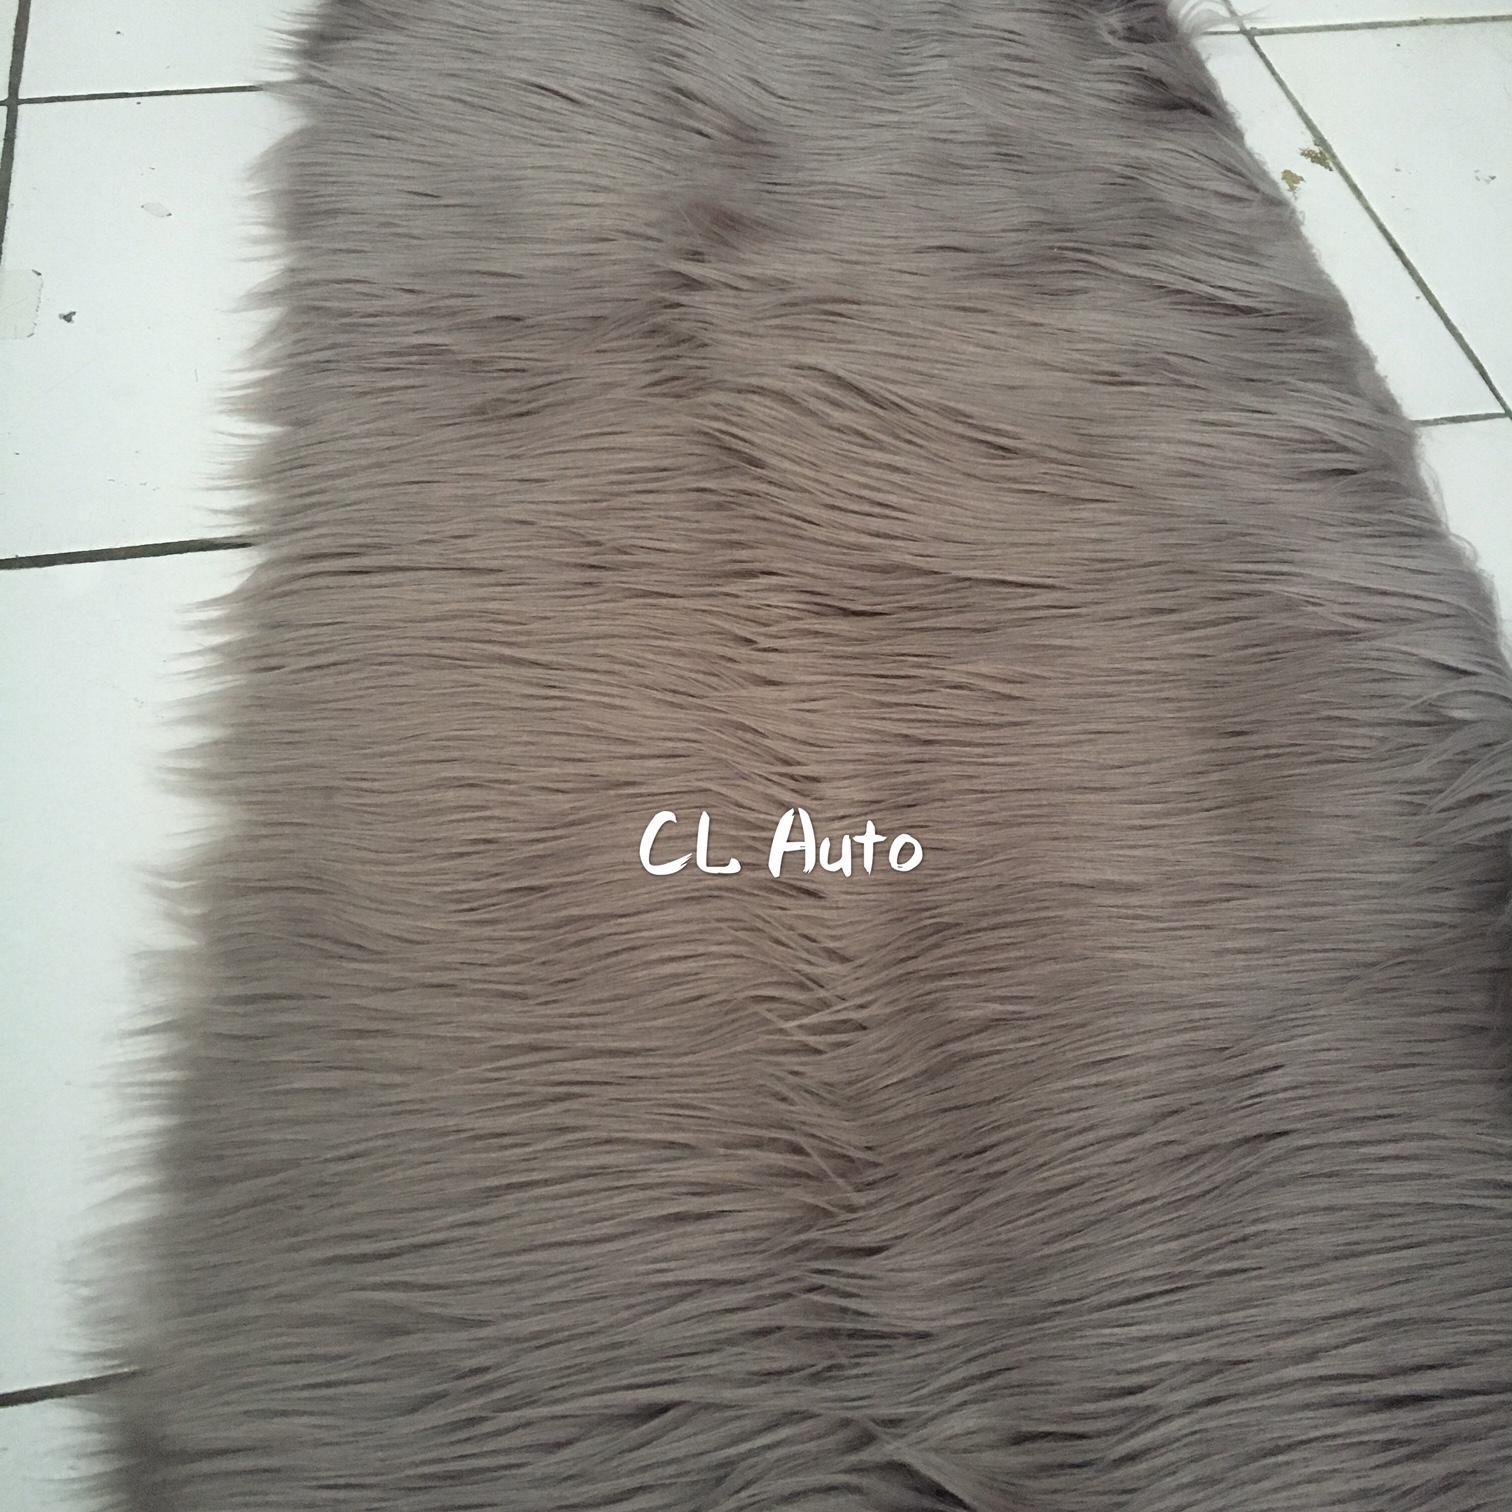 Buy Sell Cheapest Taplak Meja Grey Best Quality Product Deals Bulu Rasfur Dashboard Mobil Korea Warna Abu Muda Alas Pelindung Sinar Matahari Dashbor Rokok Dekorasi Interior Hiasan Tamu Model